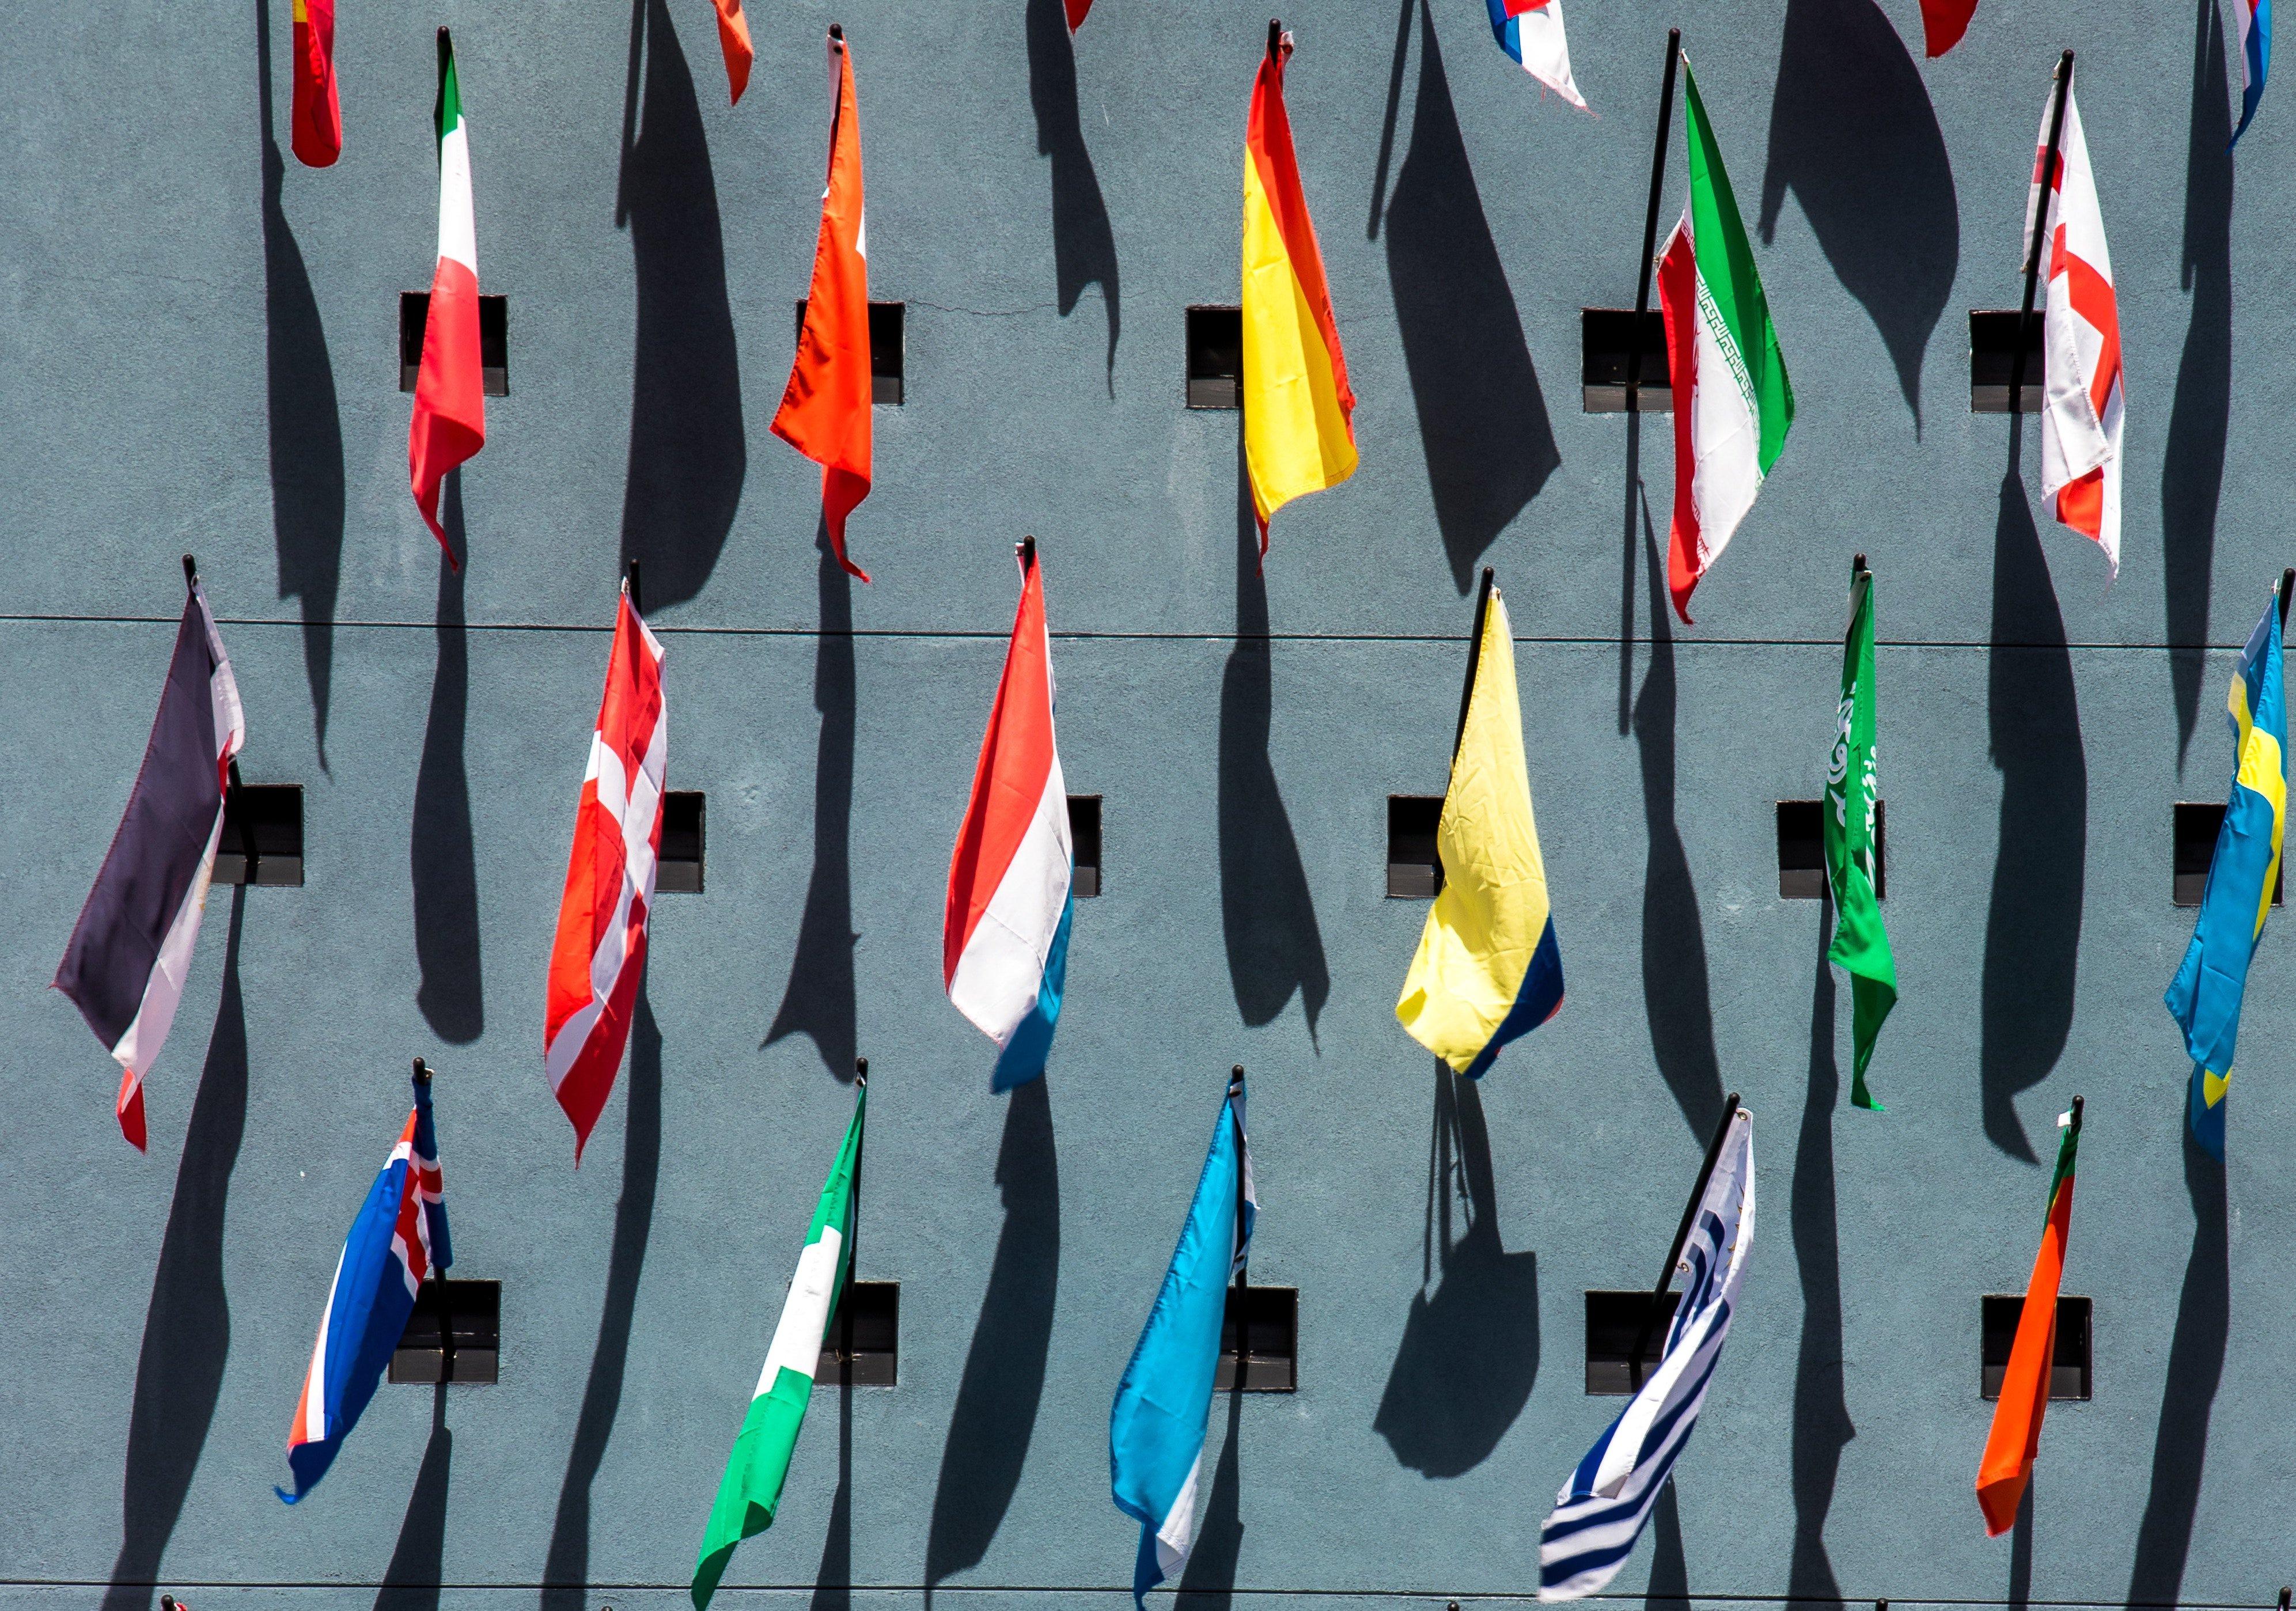 UN country flags. Credit: Jason Leung/Unsplash 2018